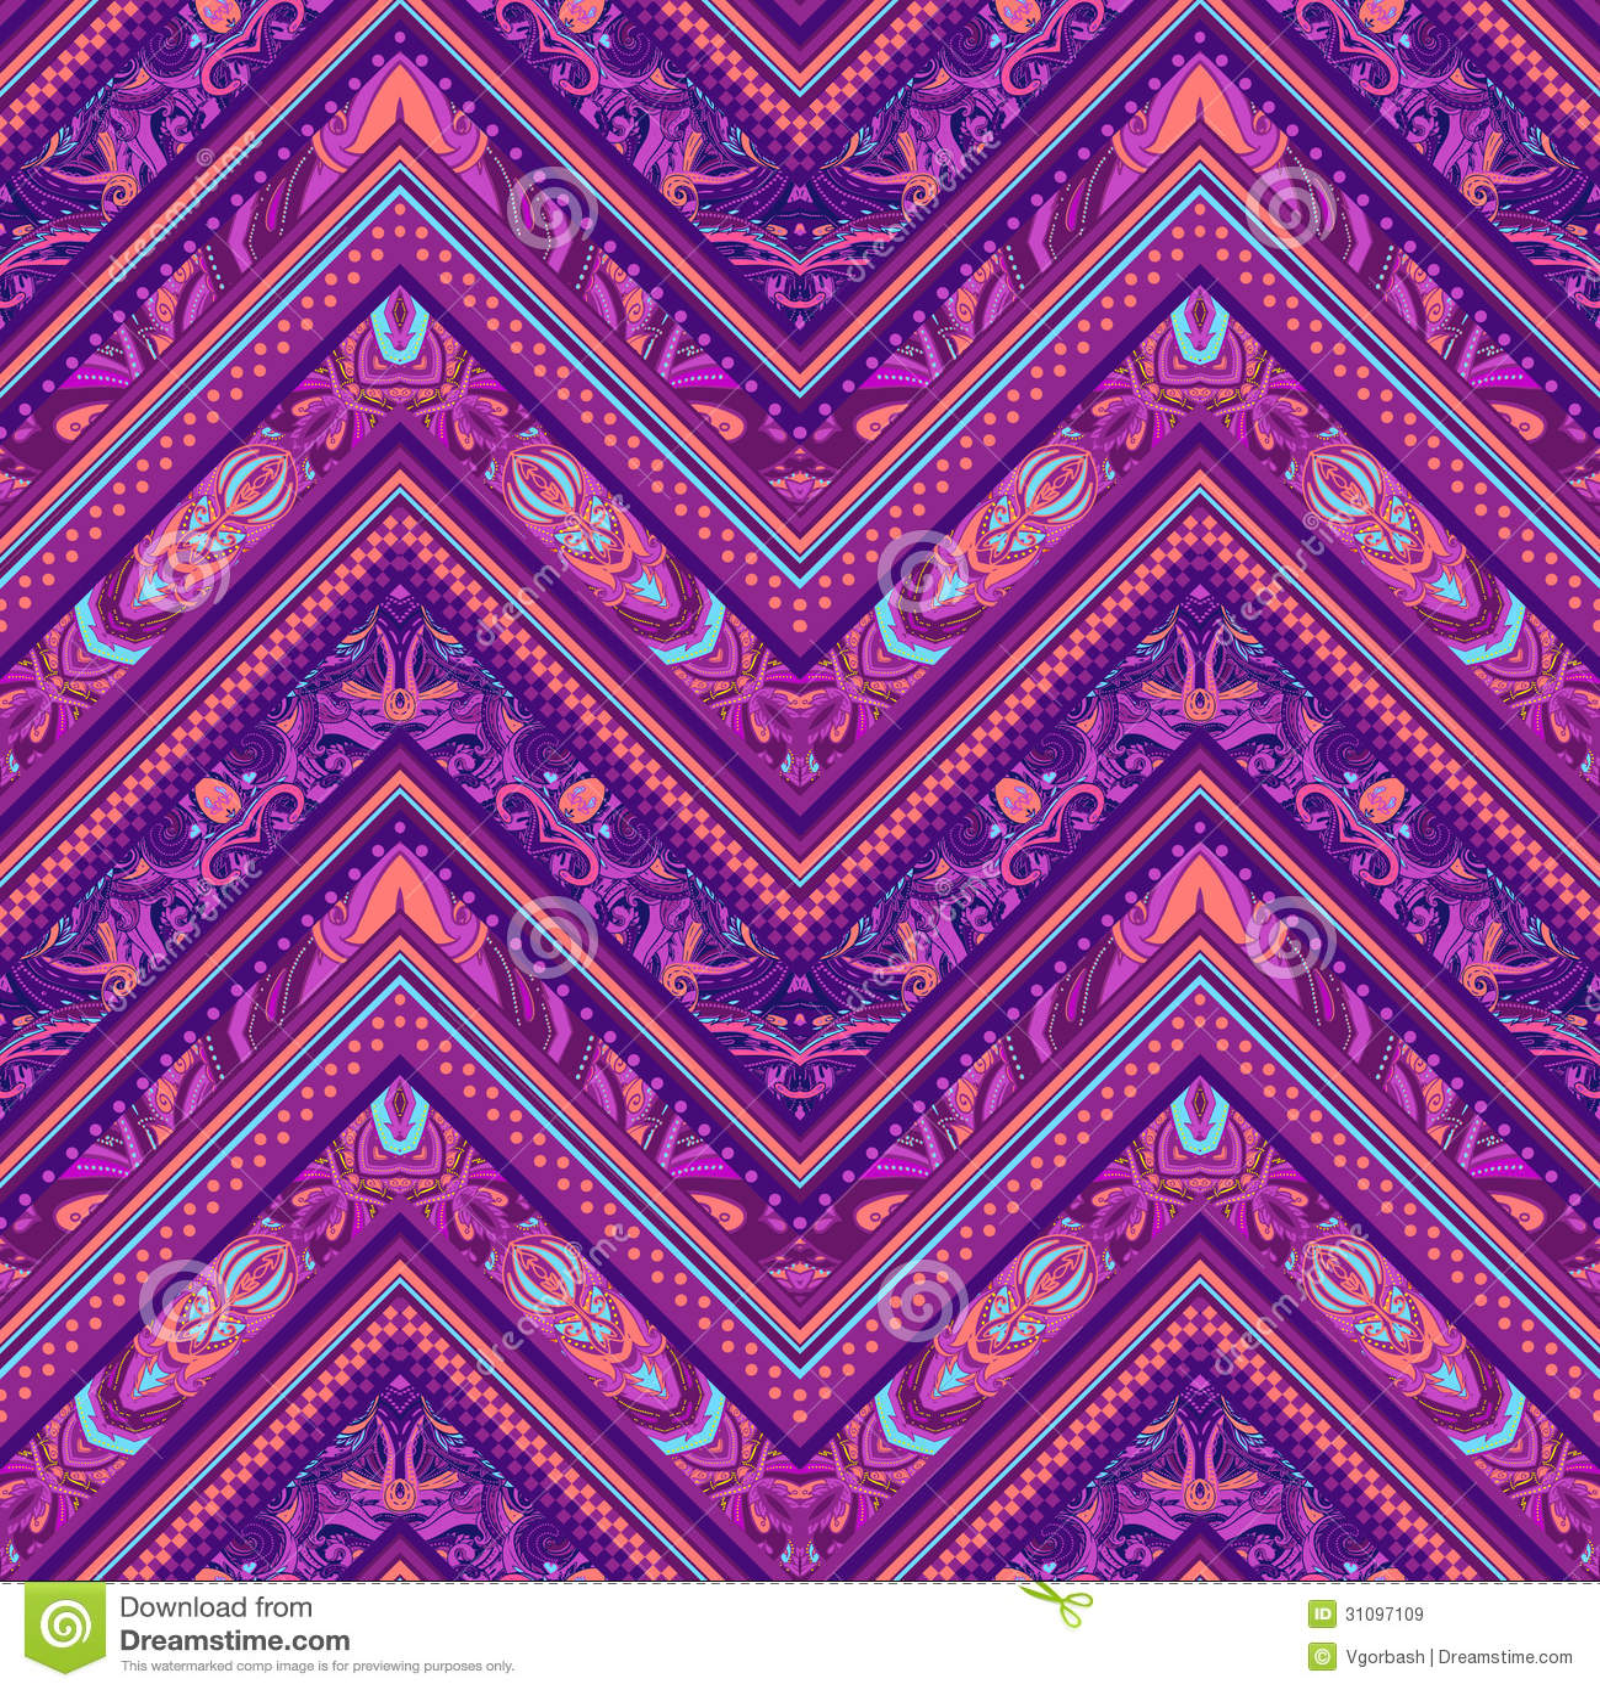 Abstract Geometric Ethnic Striped Seamless Fabric Pattern